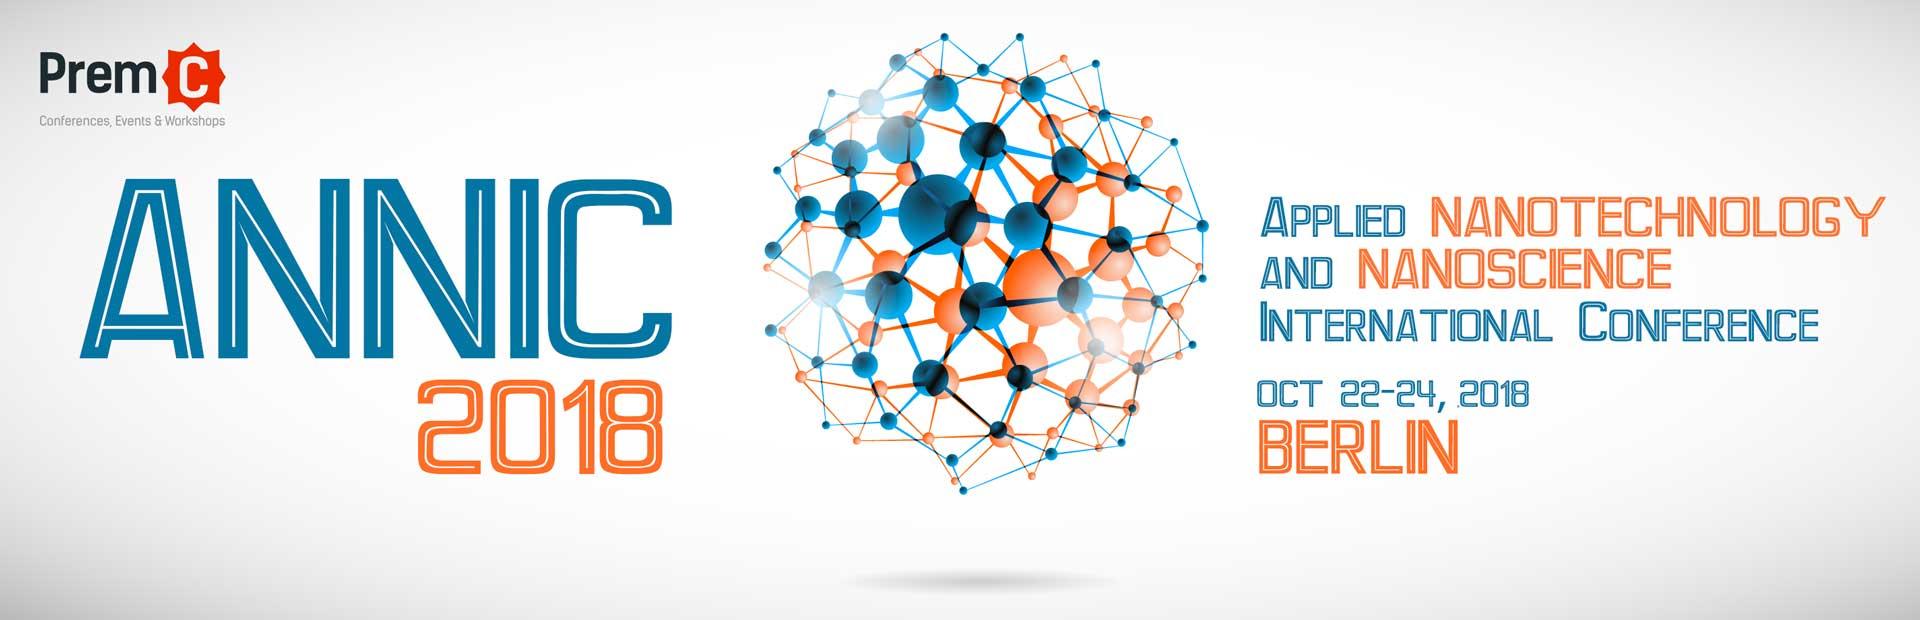 Applied Nanotechnology and Nanoscience International Conference - ANNIC 2018